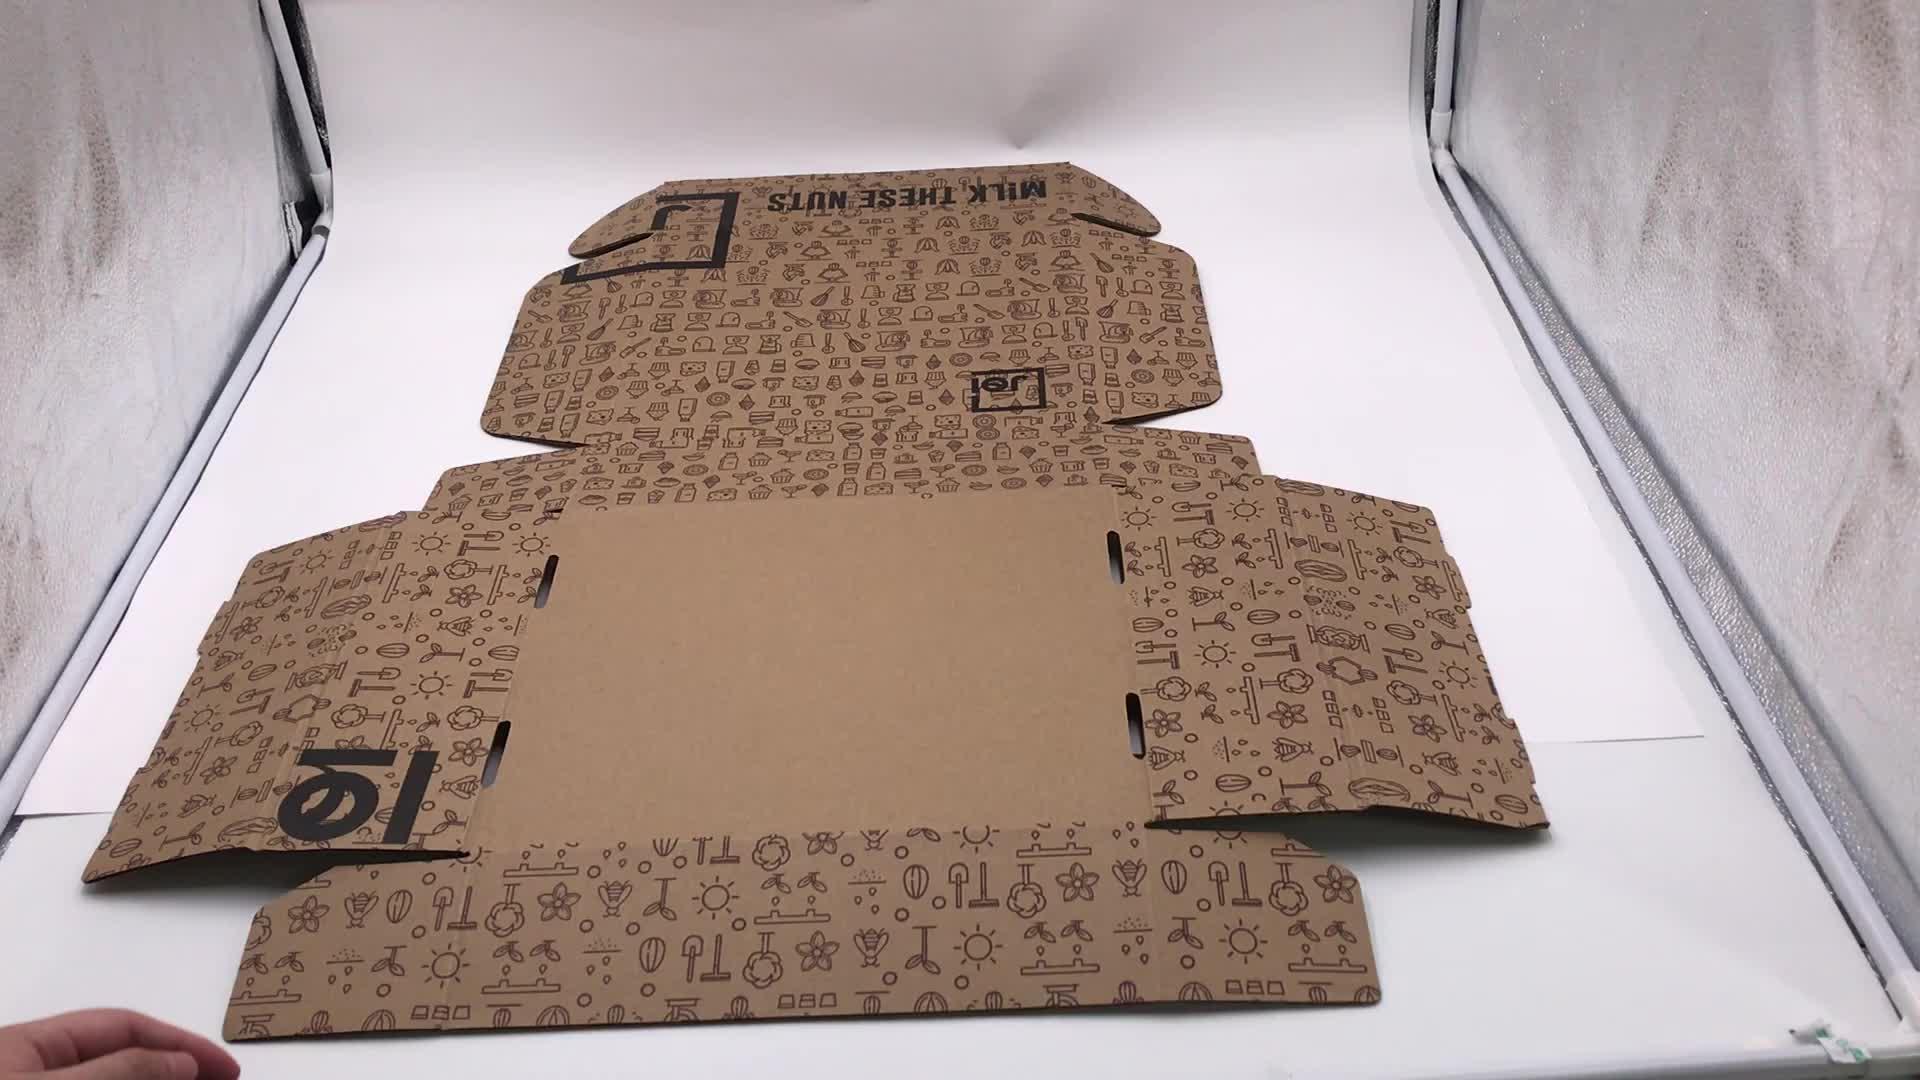 अमेज़न ई वाणिज्य पर्यावरण के अनुकूल ई-बांसुरी नालीदार गत्ता बॉक्स कस्टम पैकेजिंग पुनर्नवीनीकरण बॉक्स तह मेलर शिपिंग बॉक्स